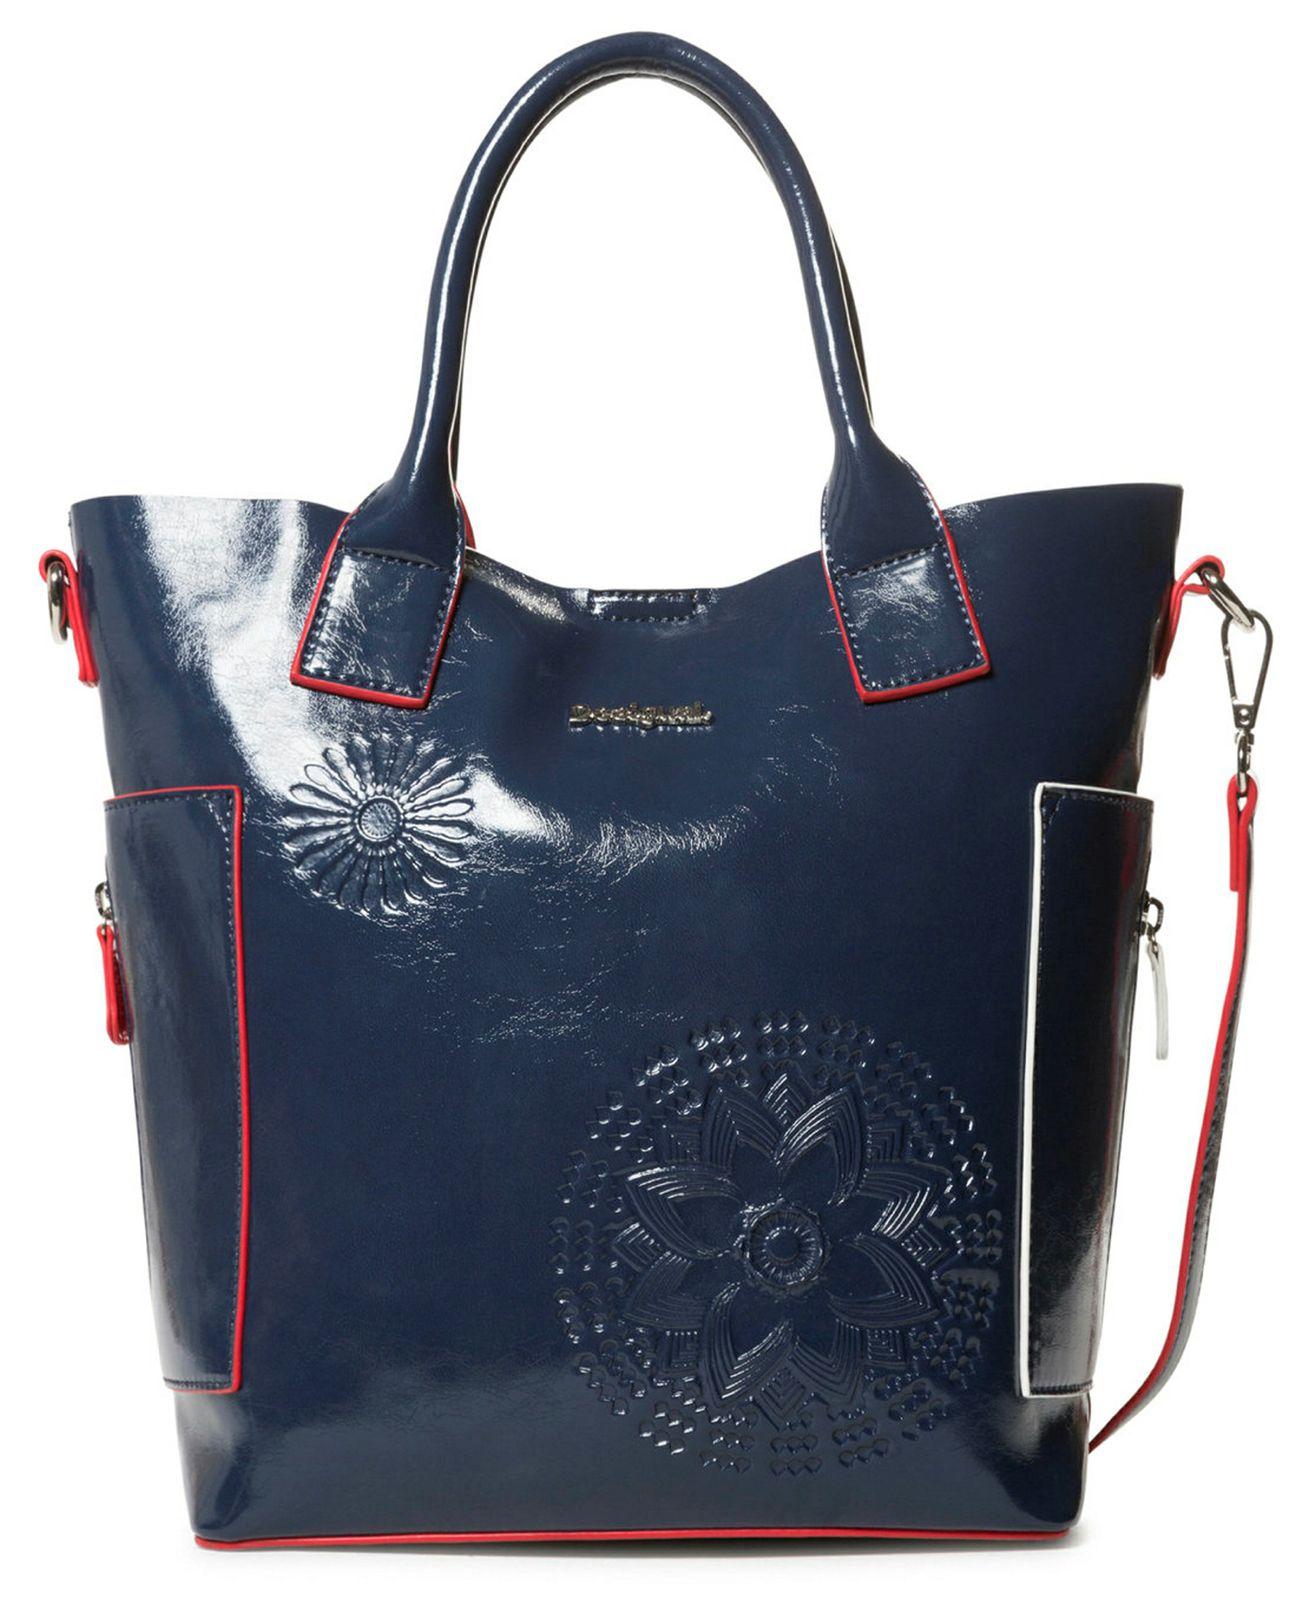 di prim'ordine 909e7 08583 Desigual Pop Vinil Shibuya Hand Bag Navy